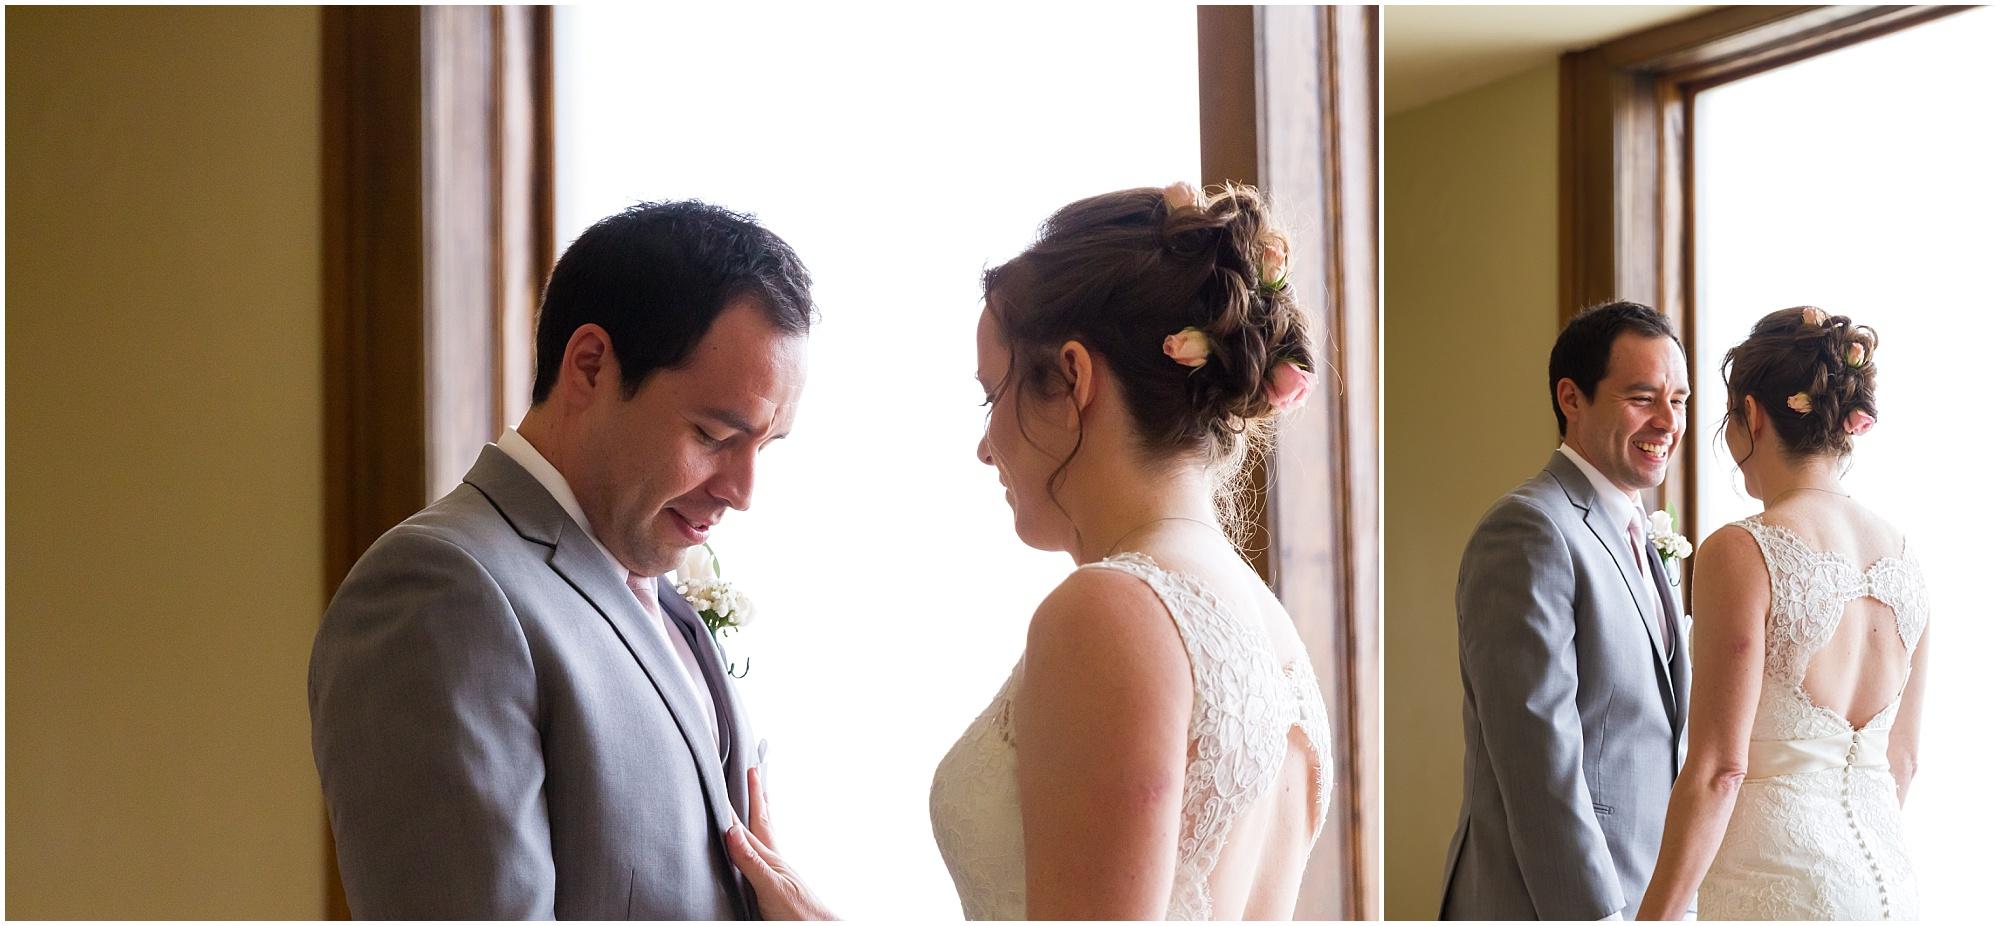 Downtown-Waco-Fall-Wedding_0009.jpg